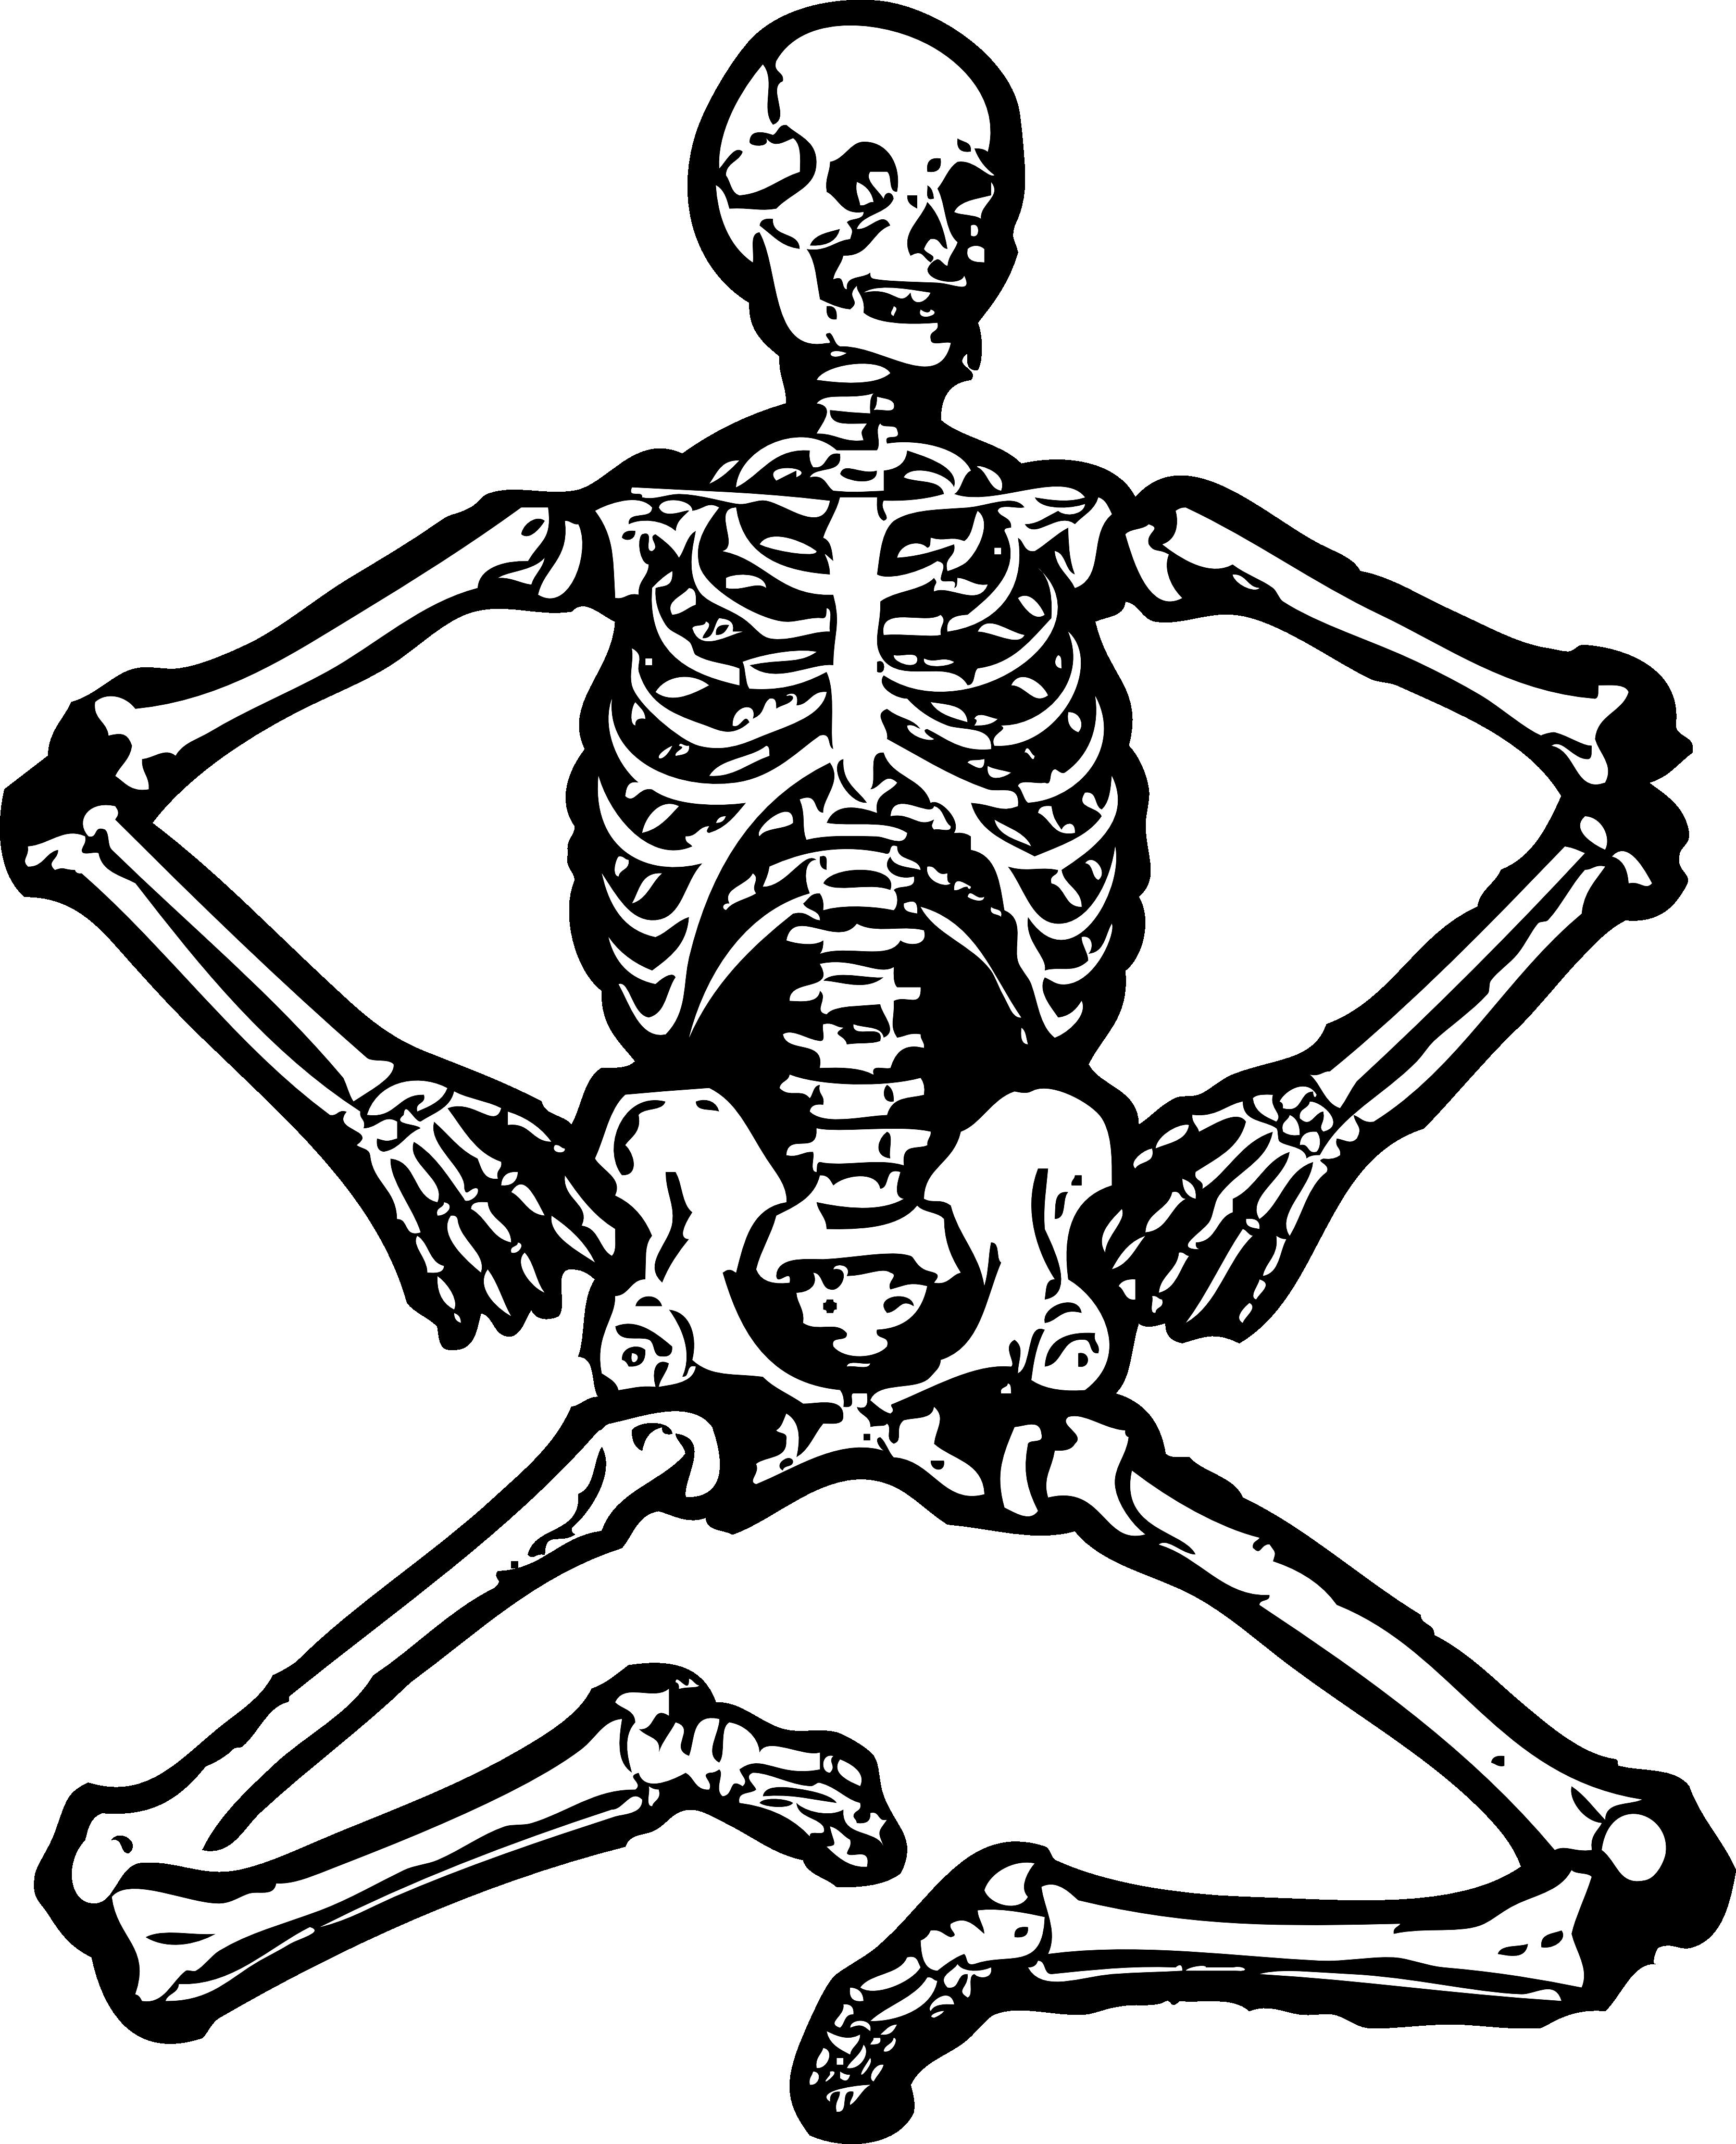 Skeleton clipart. Bone printingbrochures info human